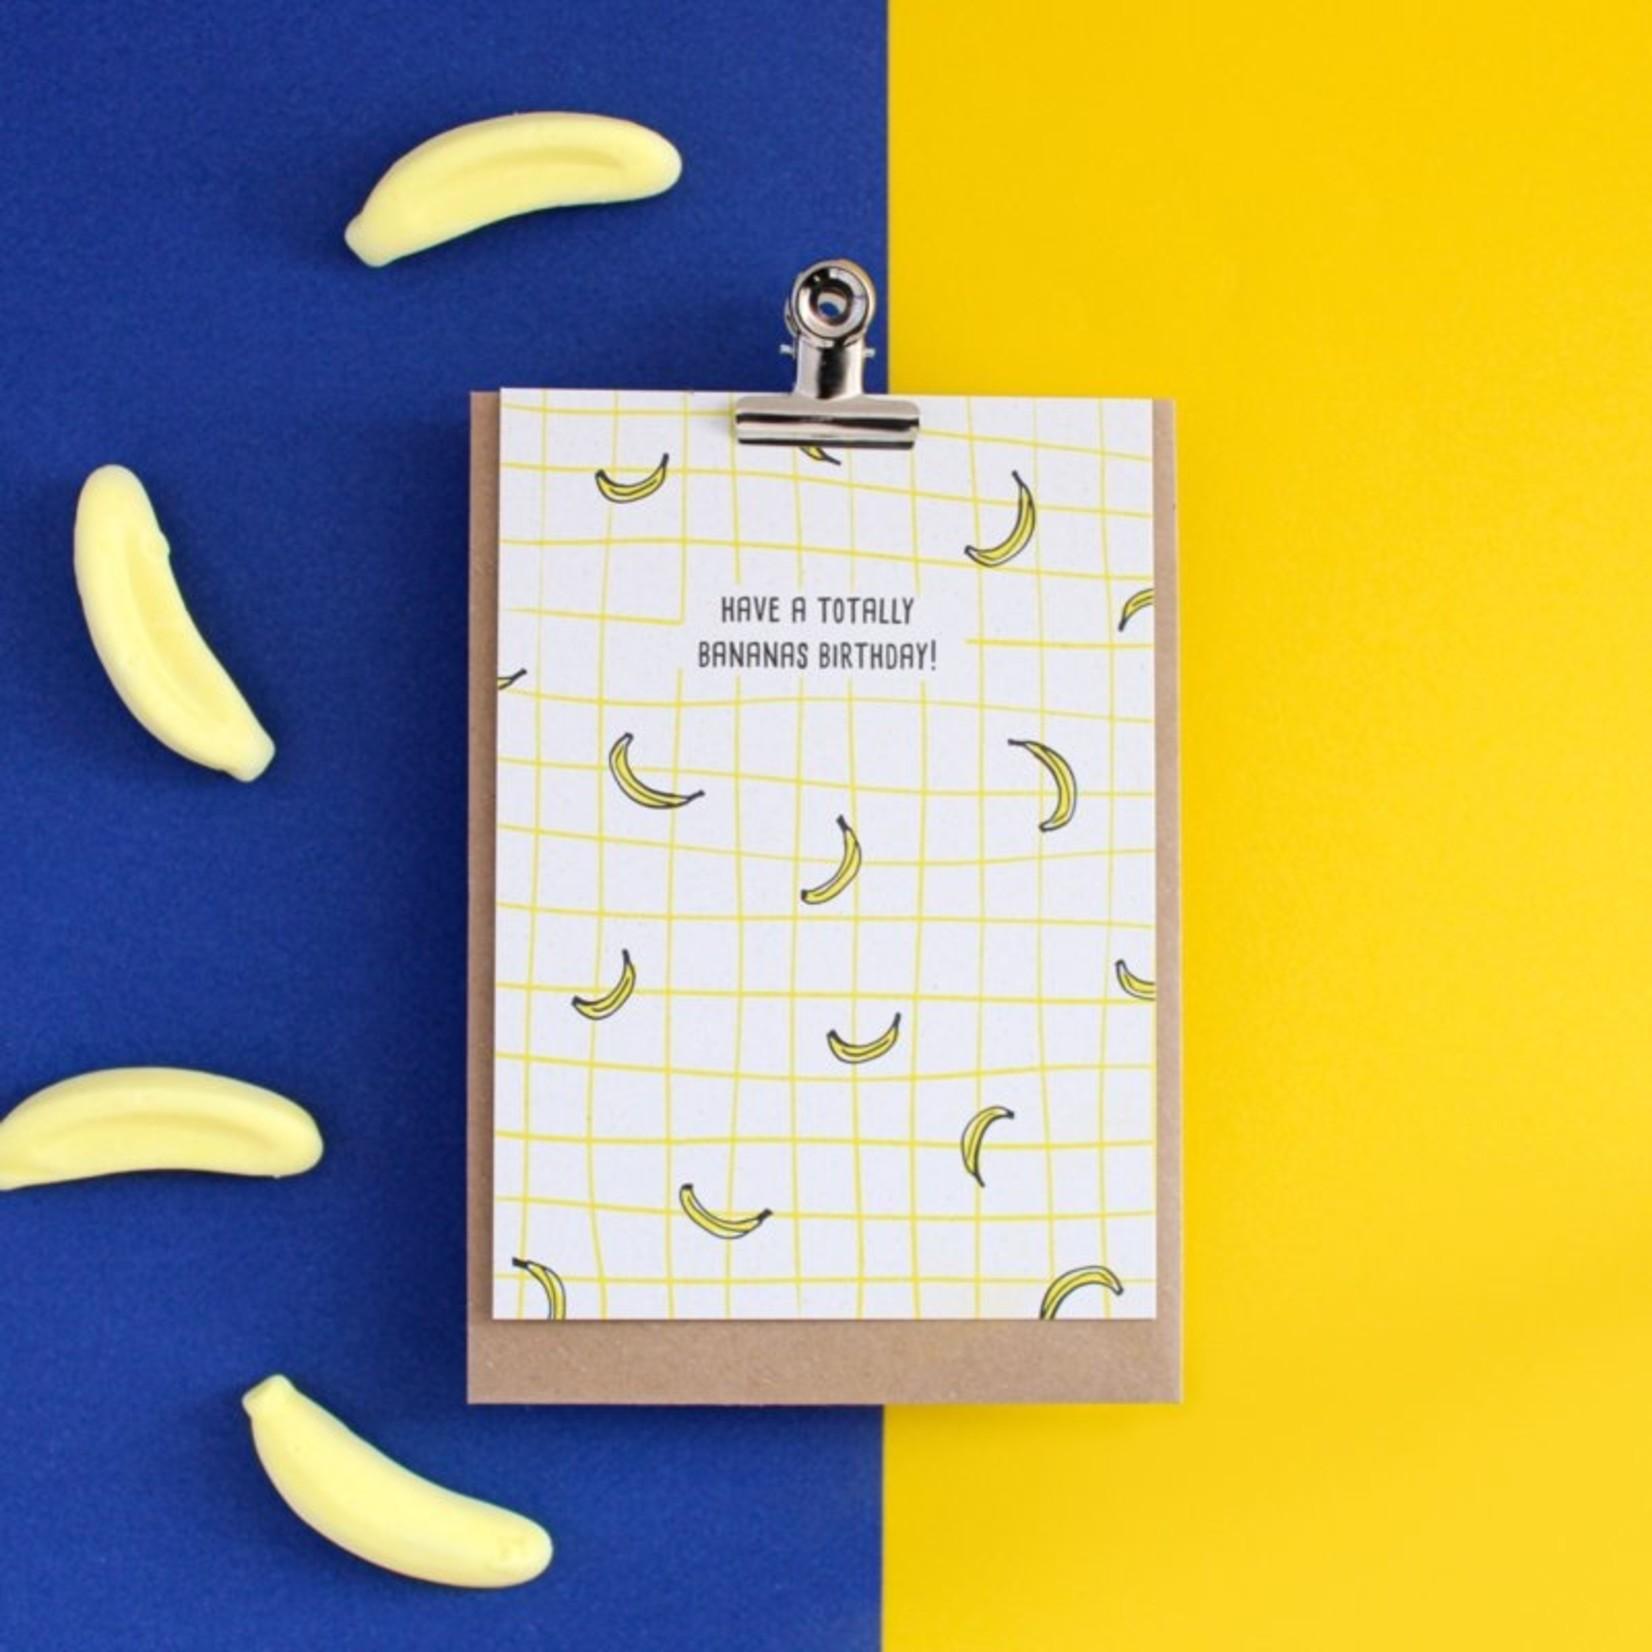 Postkaart - Have a totally bananas birthday